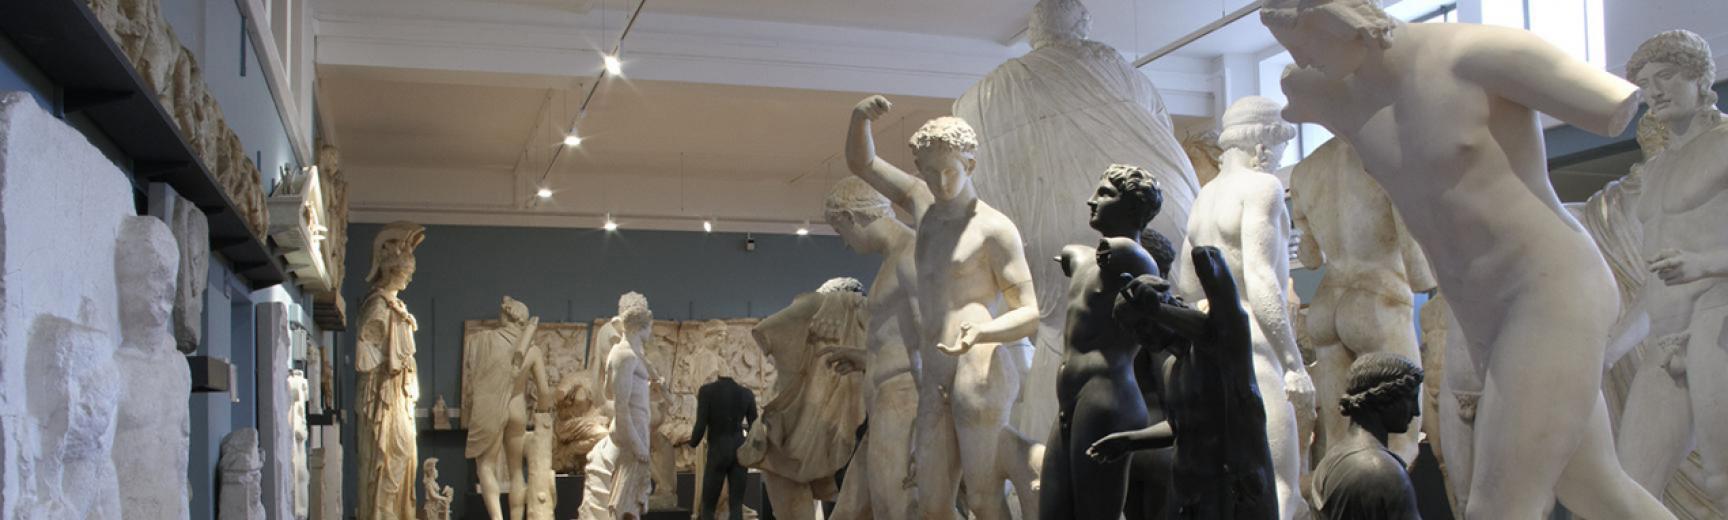 Ashmolean Museum Lower Cast Gallery